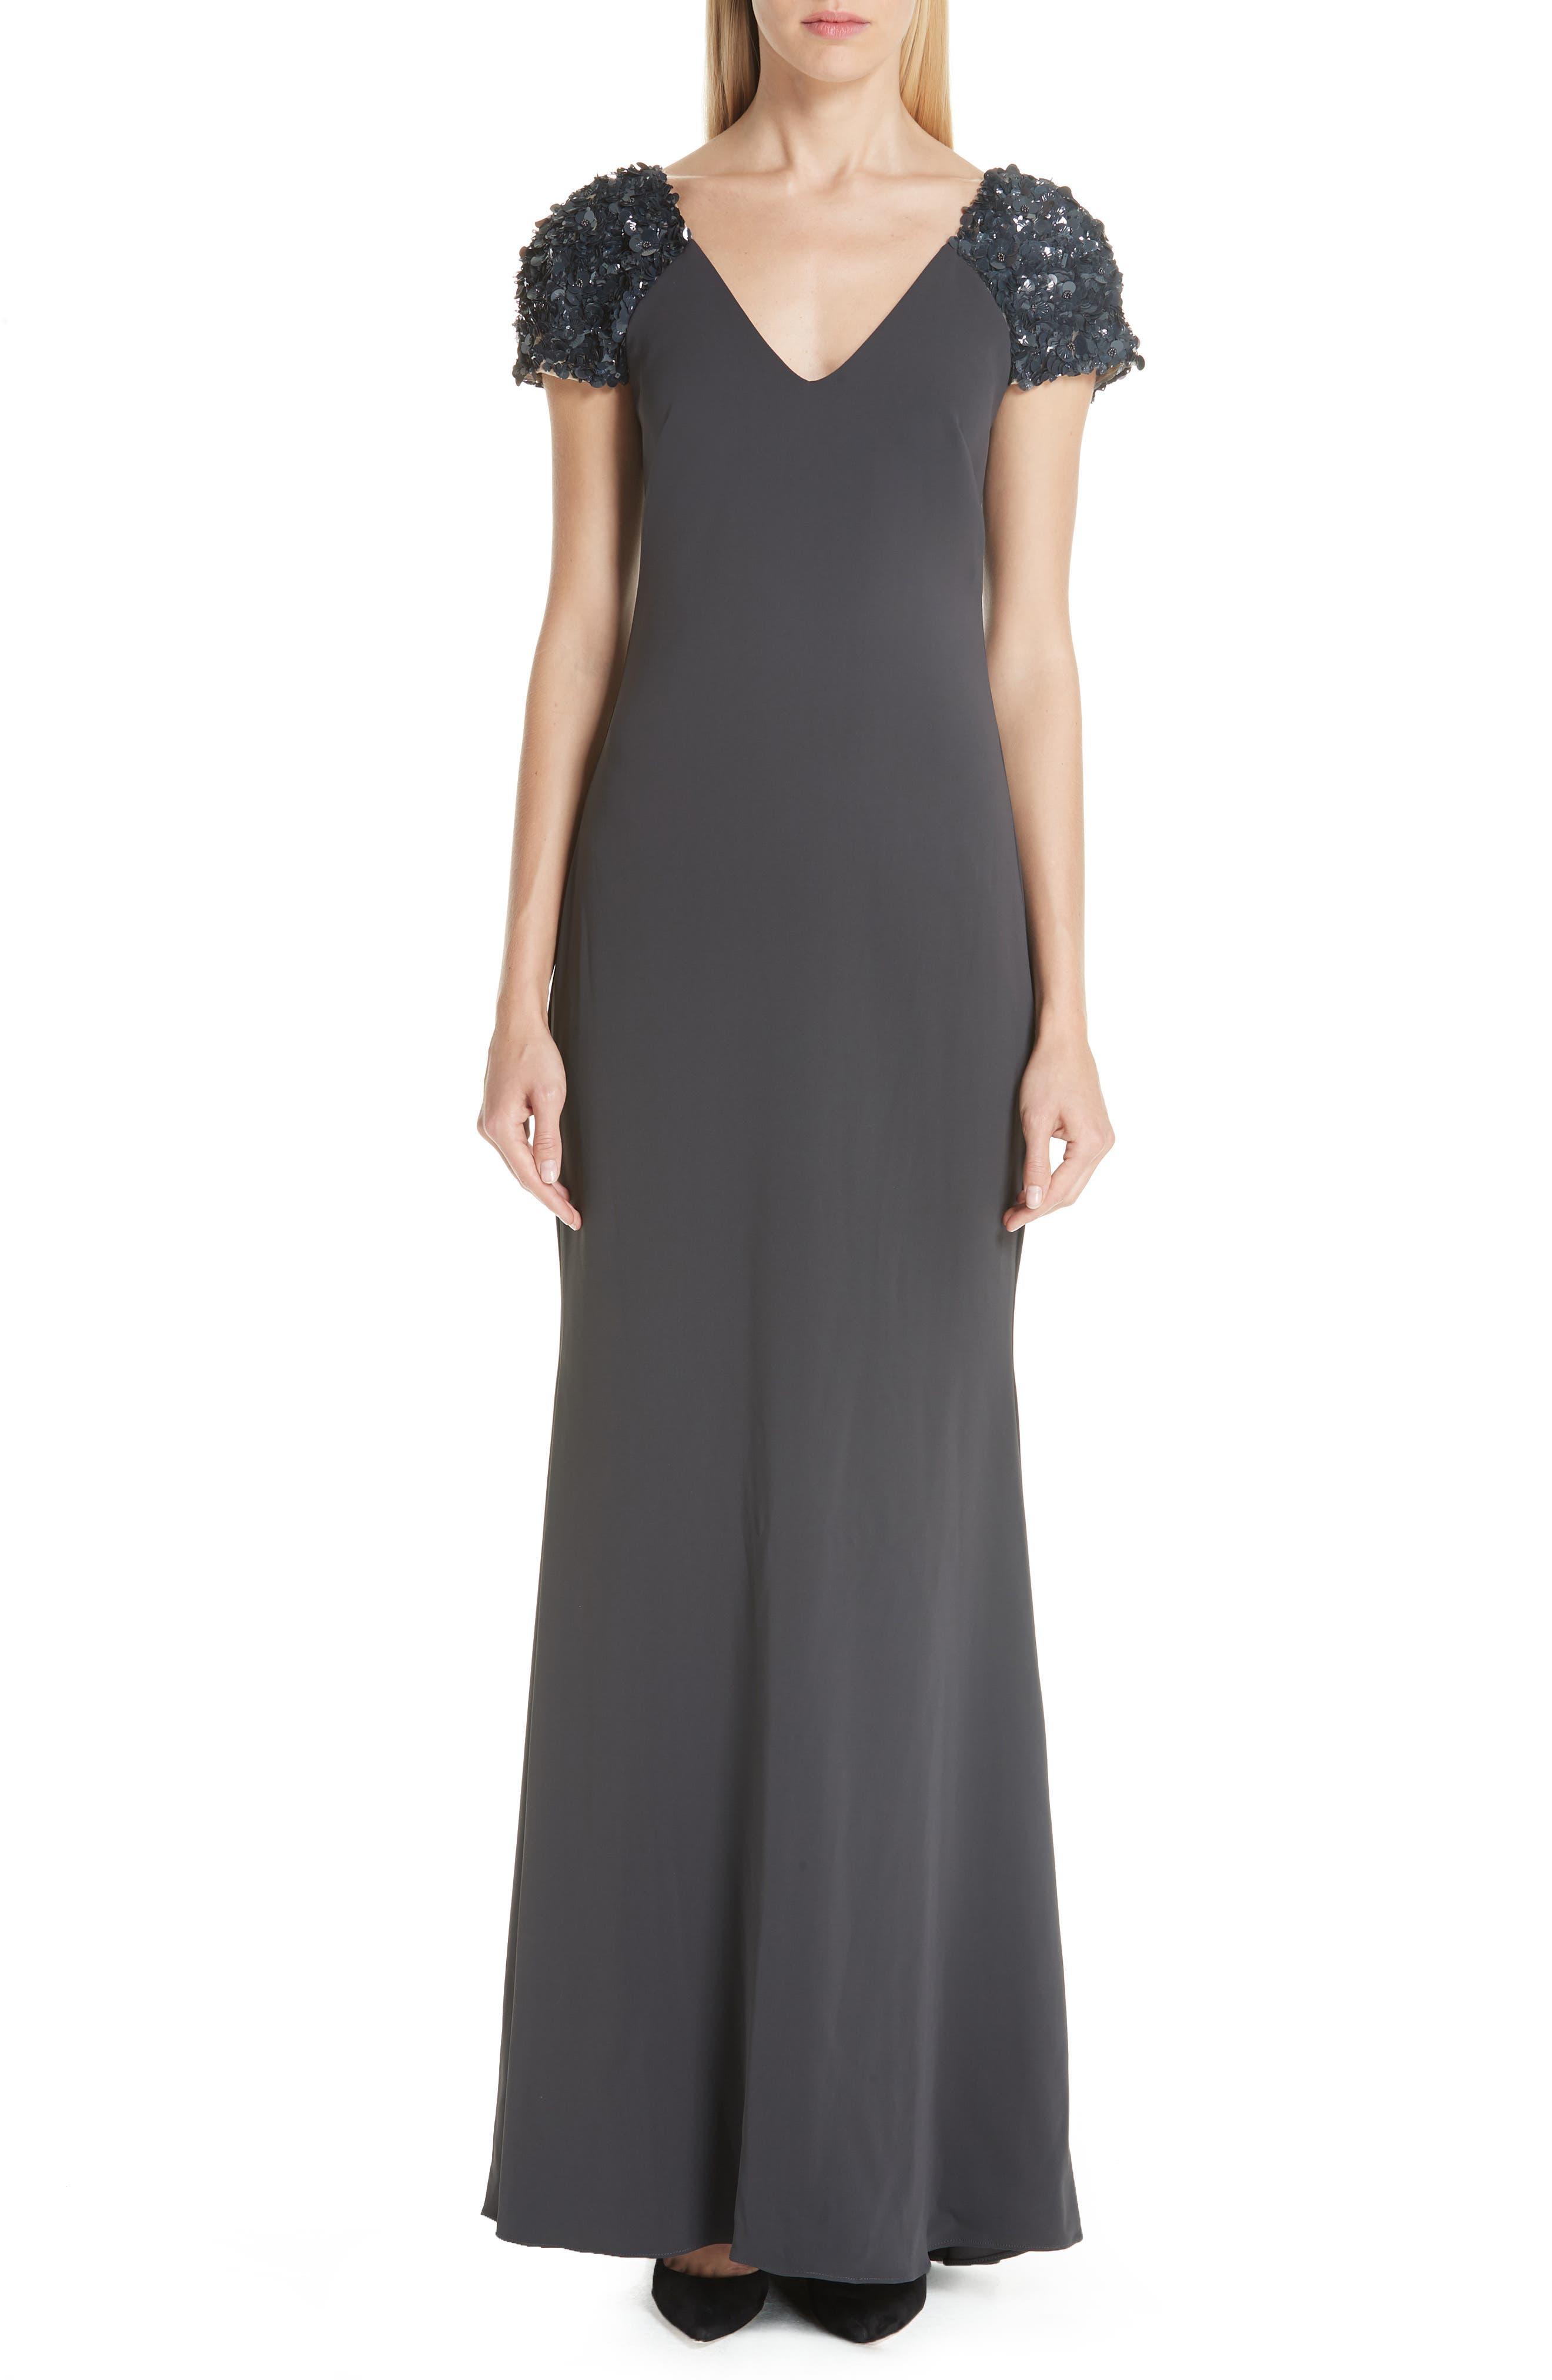 Badgley Mischka Collection Beaded Cap Sleeve Gown, Grey